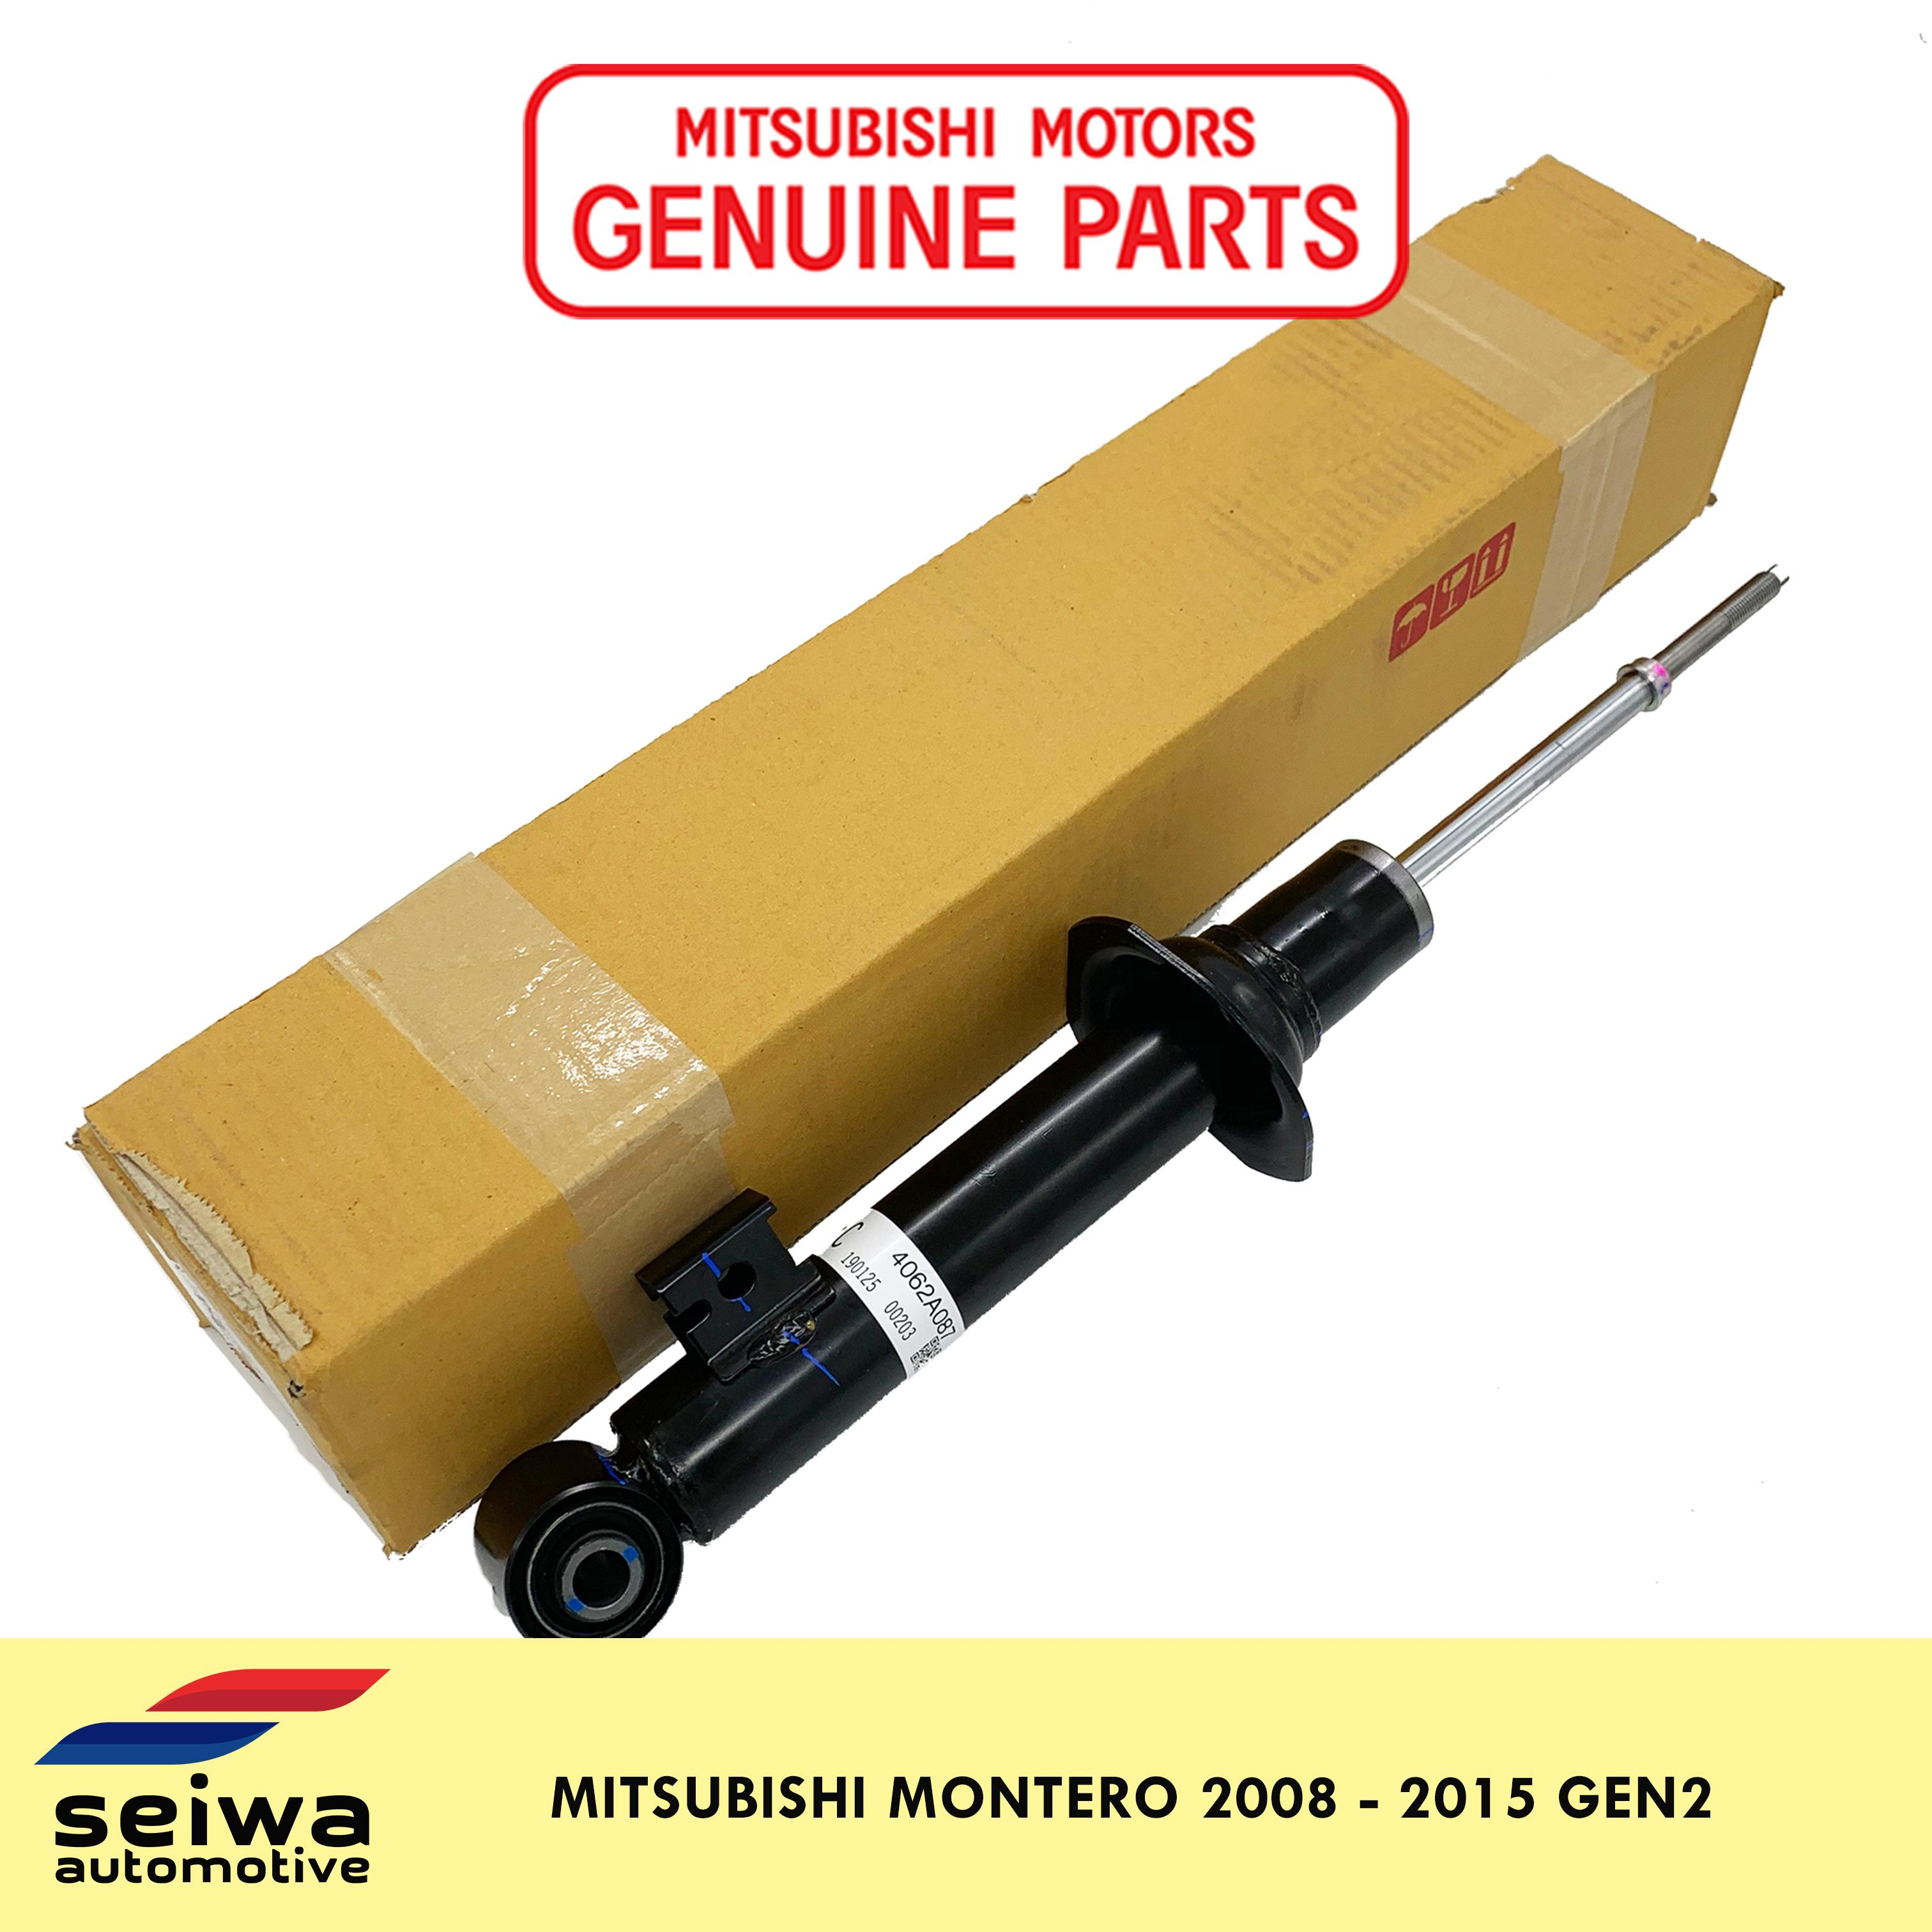 Mitsubishi Montero GEN2 2008-2015 Front Shock Absorber - Genuine Mitsubishi  Auto Parts - 4062A085/4062A111